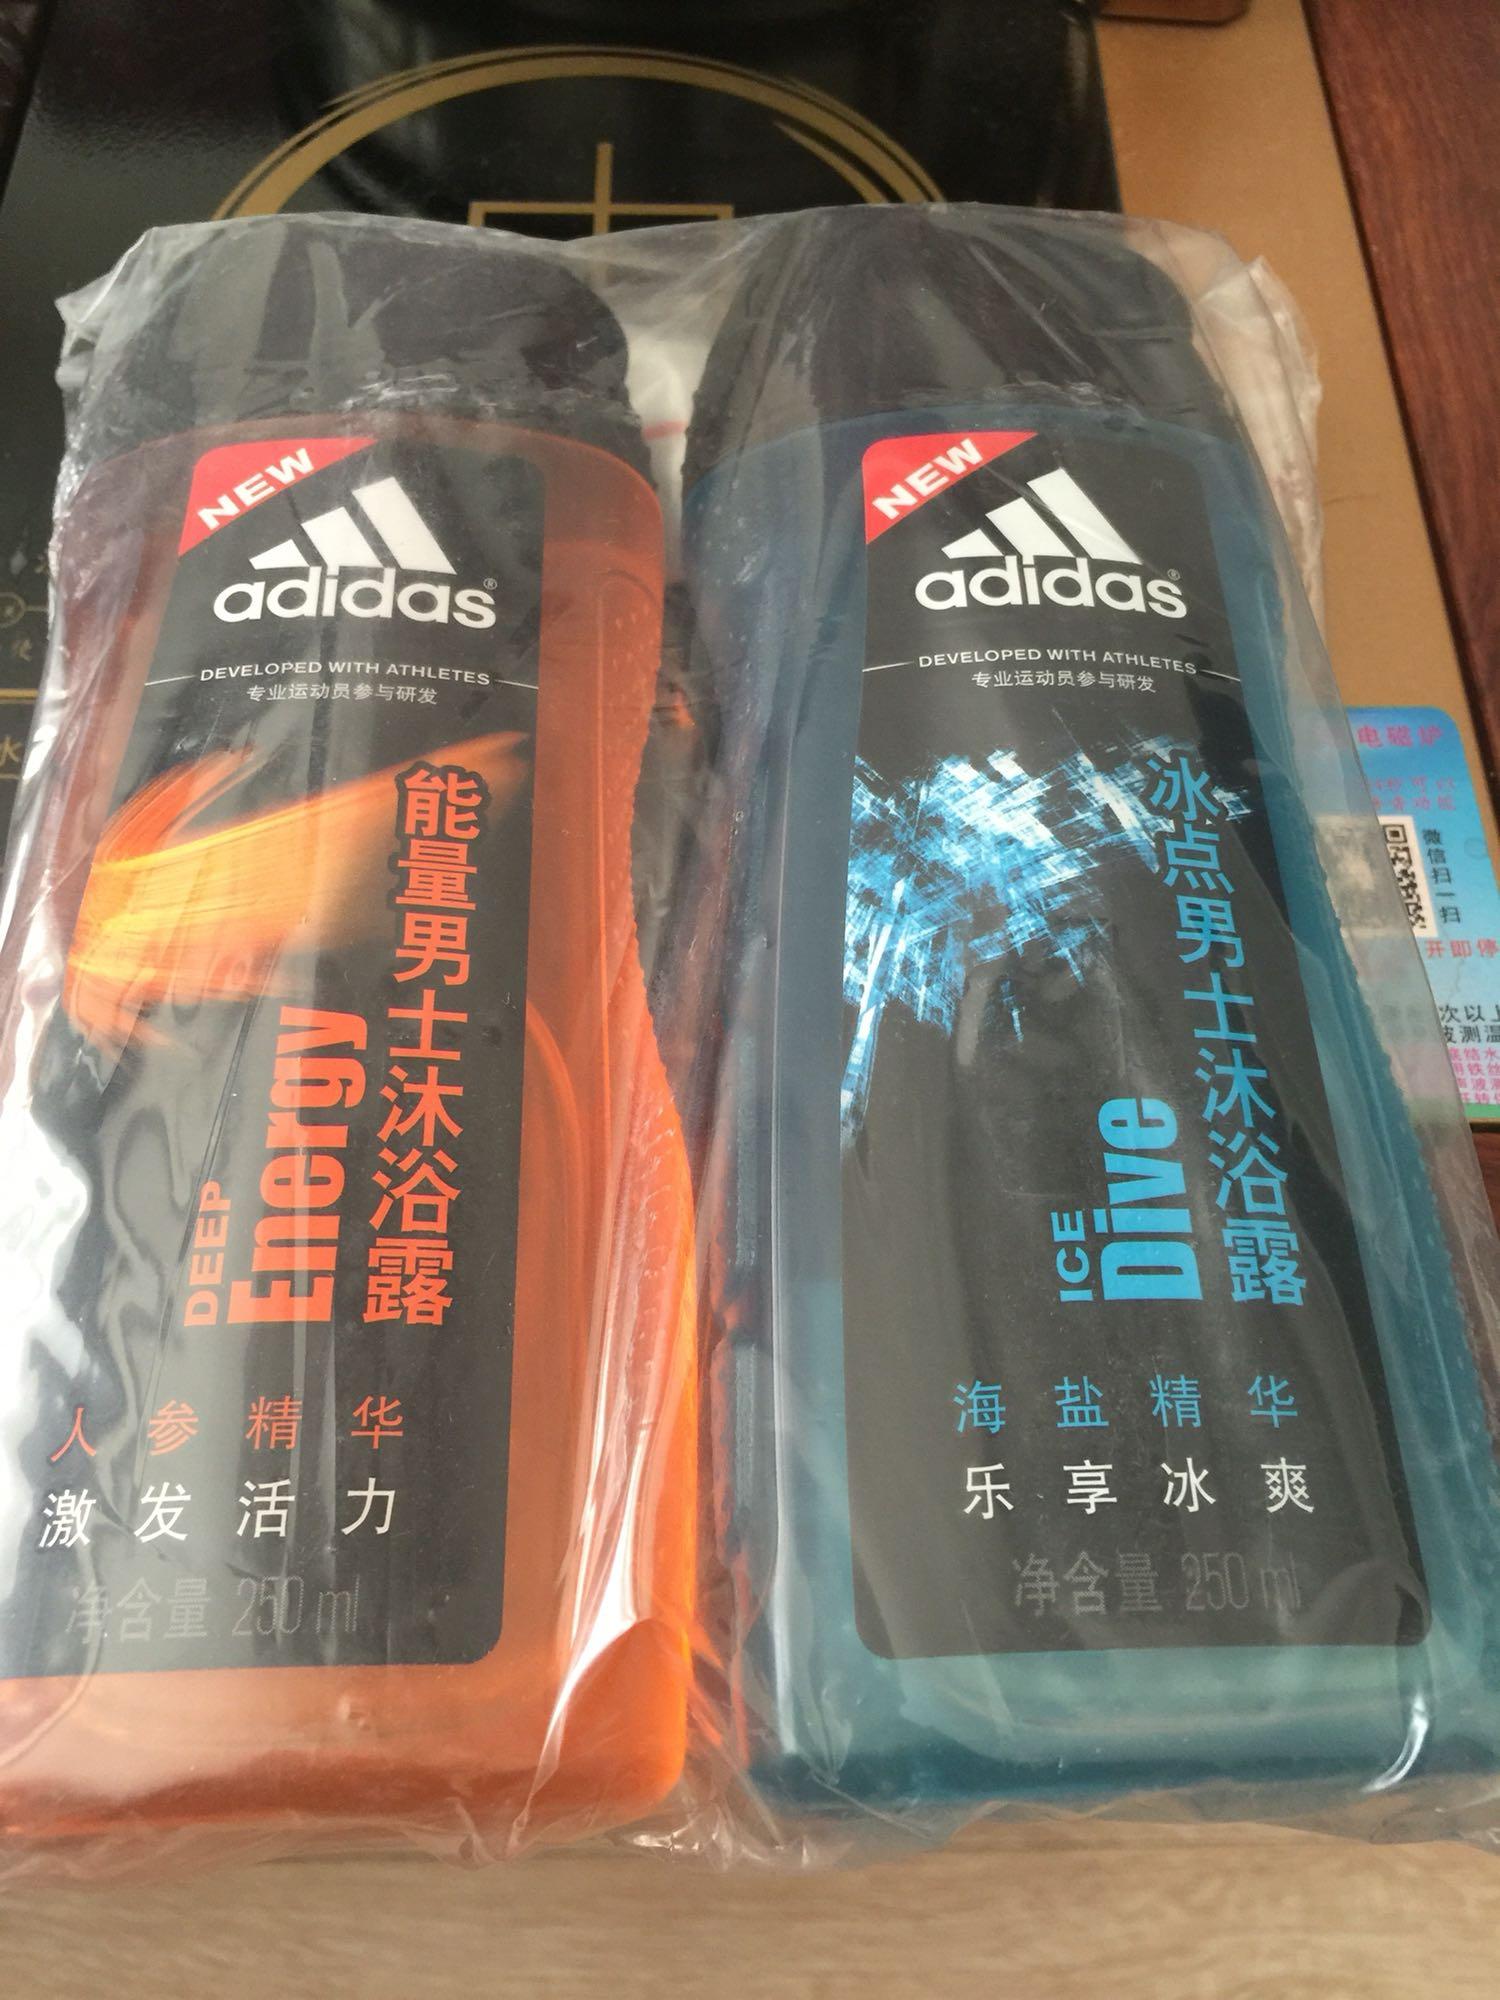 latest sport shoes for men 00227719 buy